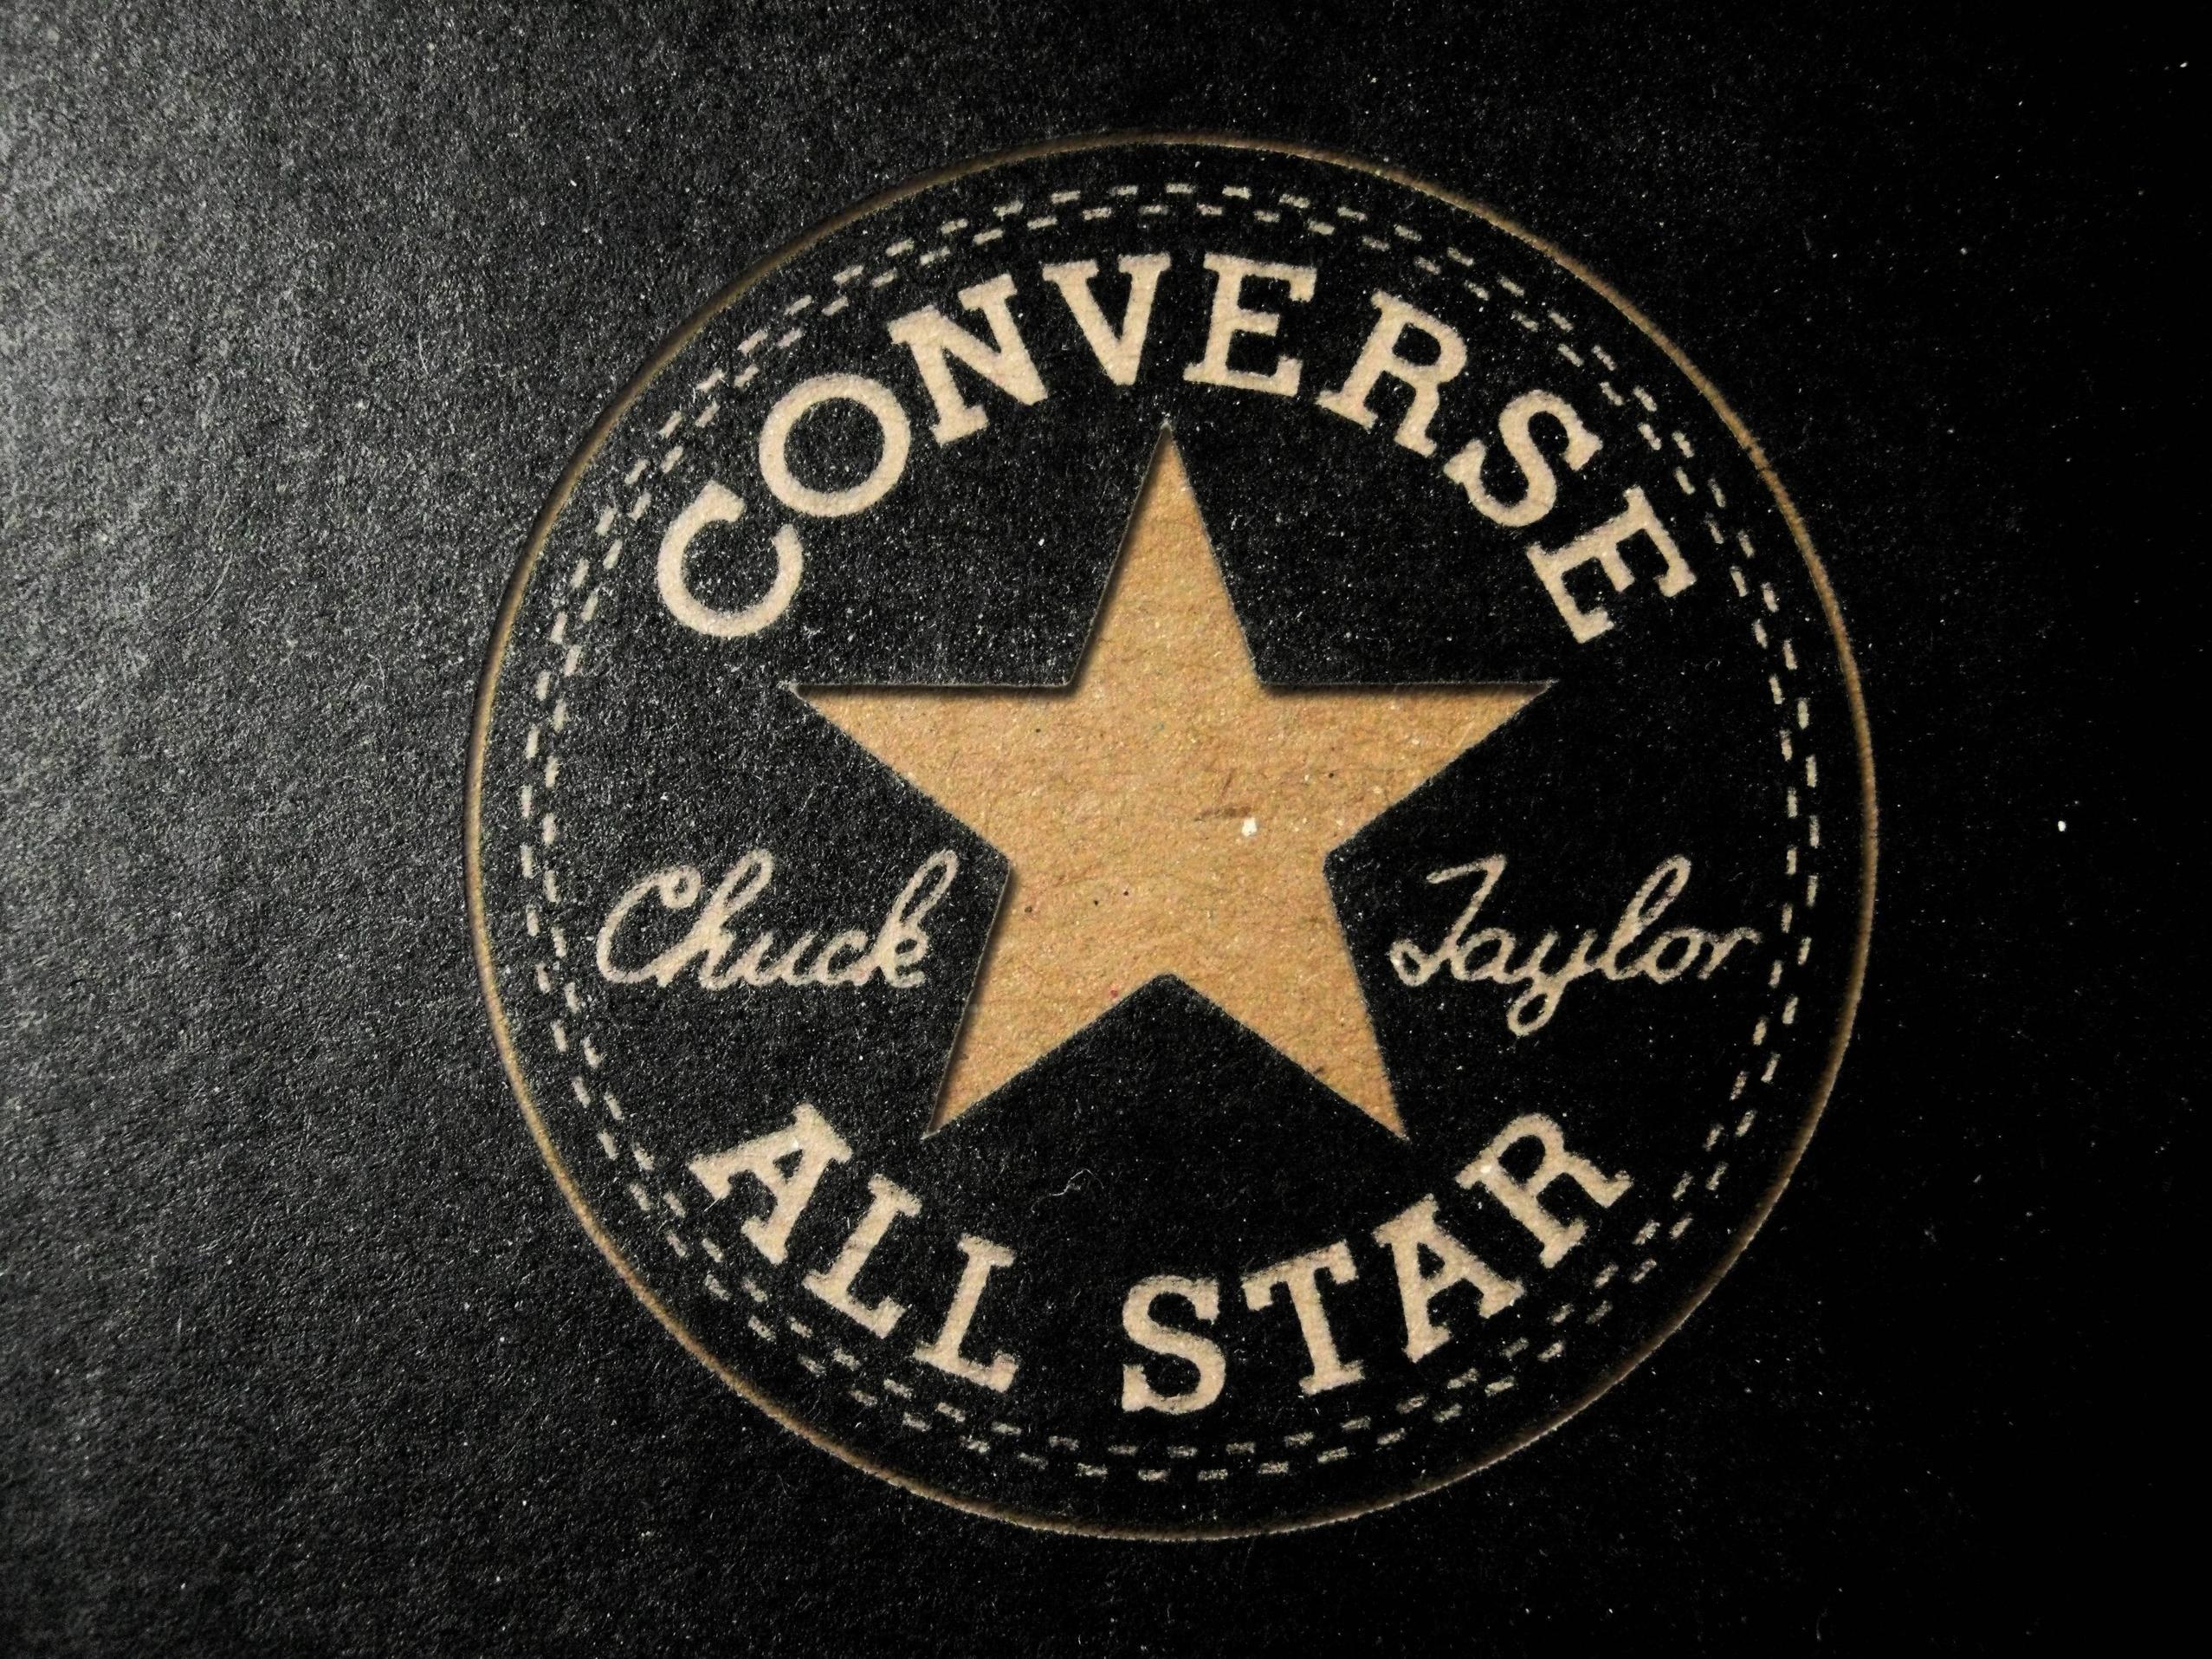 ef7d4d8905f7 Converse All Star Logo Wallpaper by VlooYoo on DeviantArt